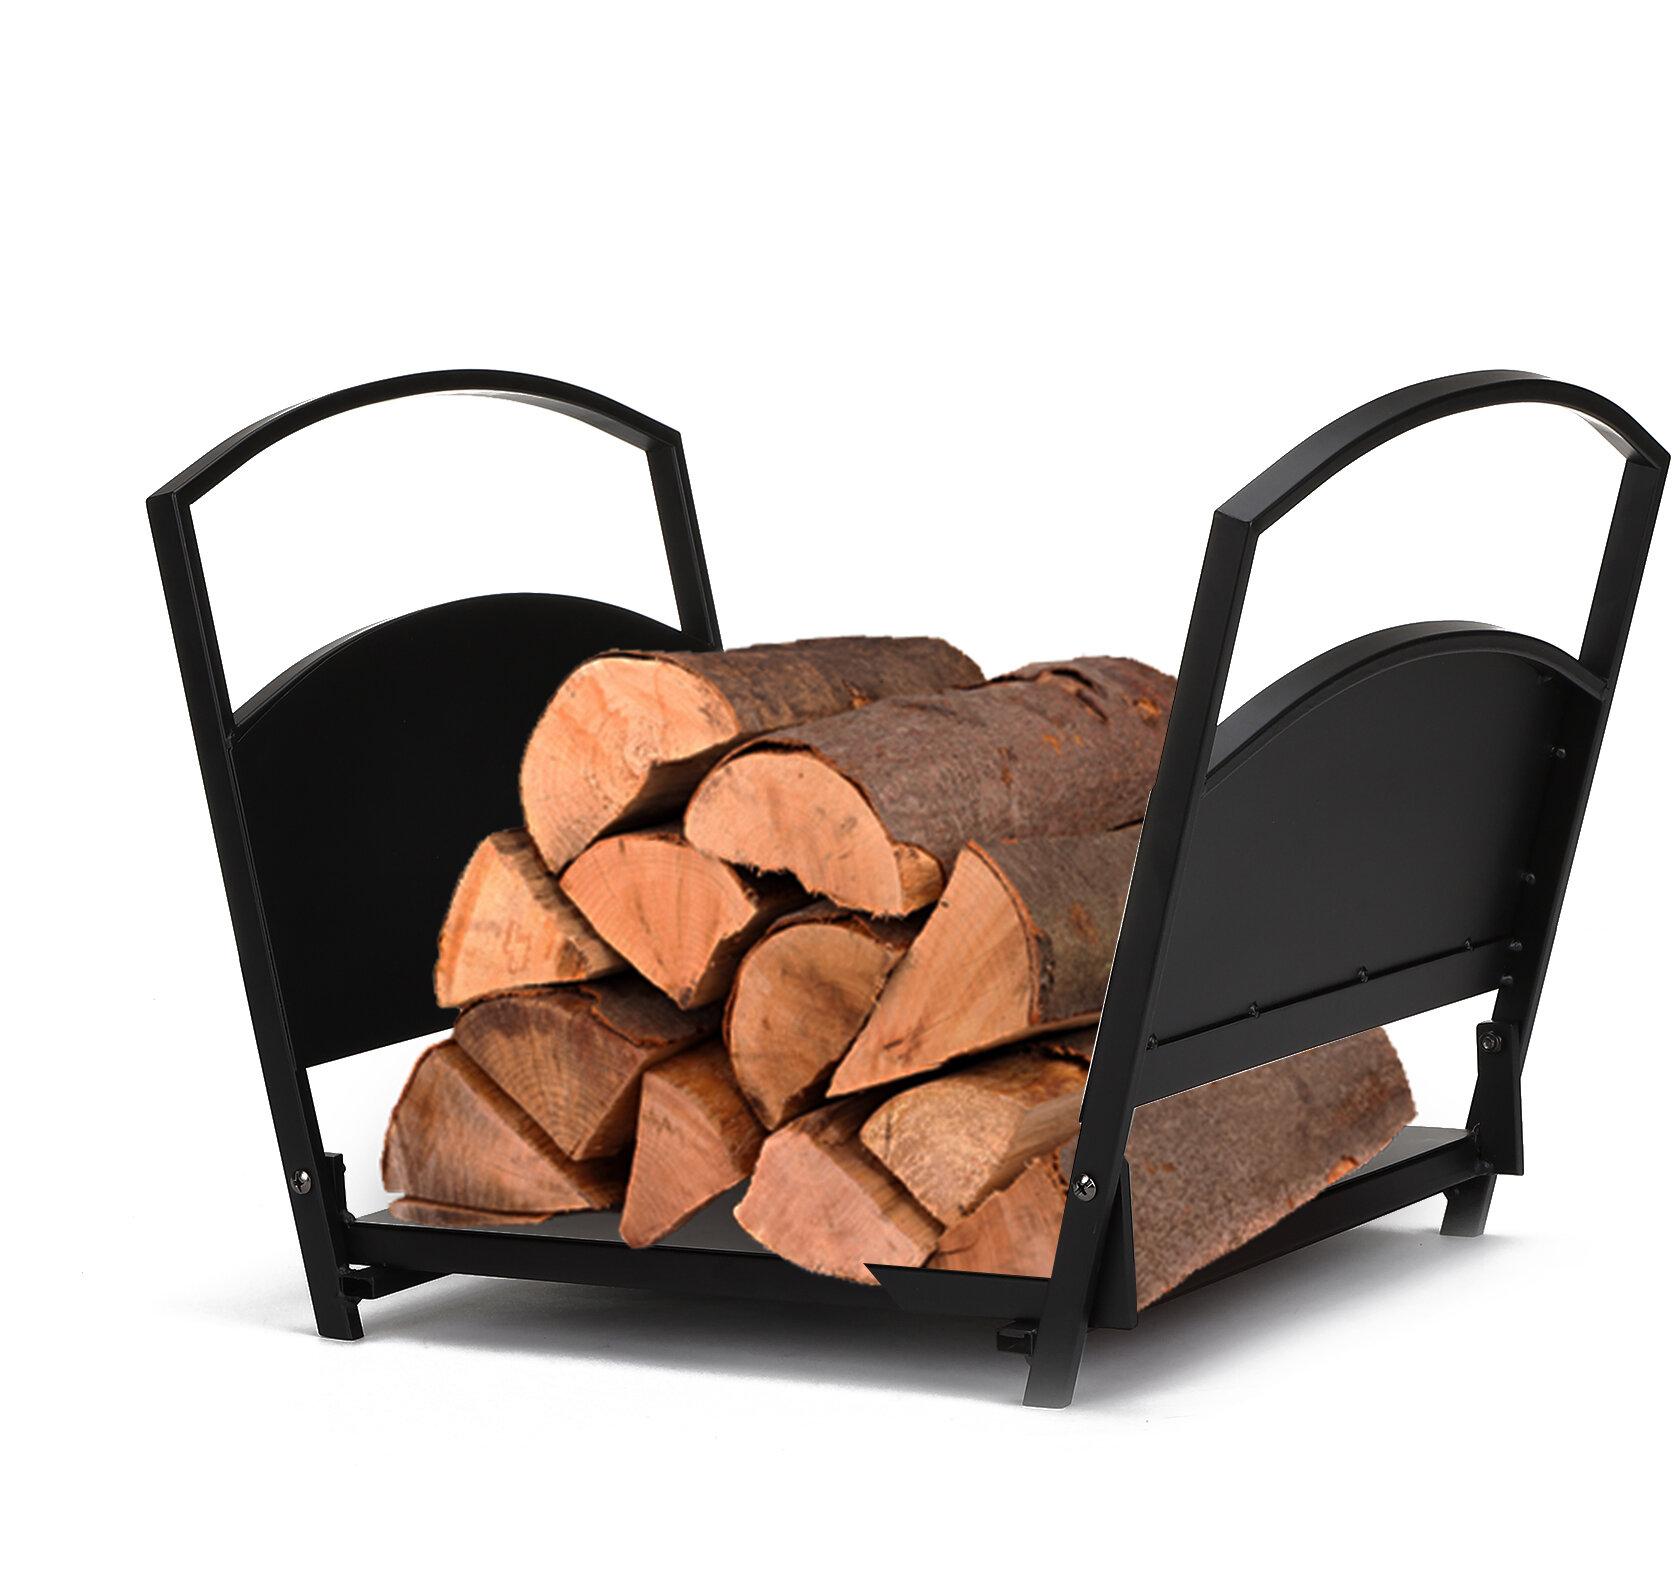 Mind Reader Fireplace Indoor Outdoor Firewood Log Rack Wayfair Ca